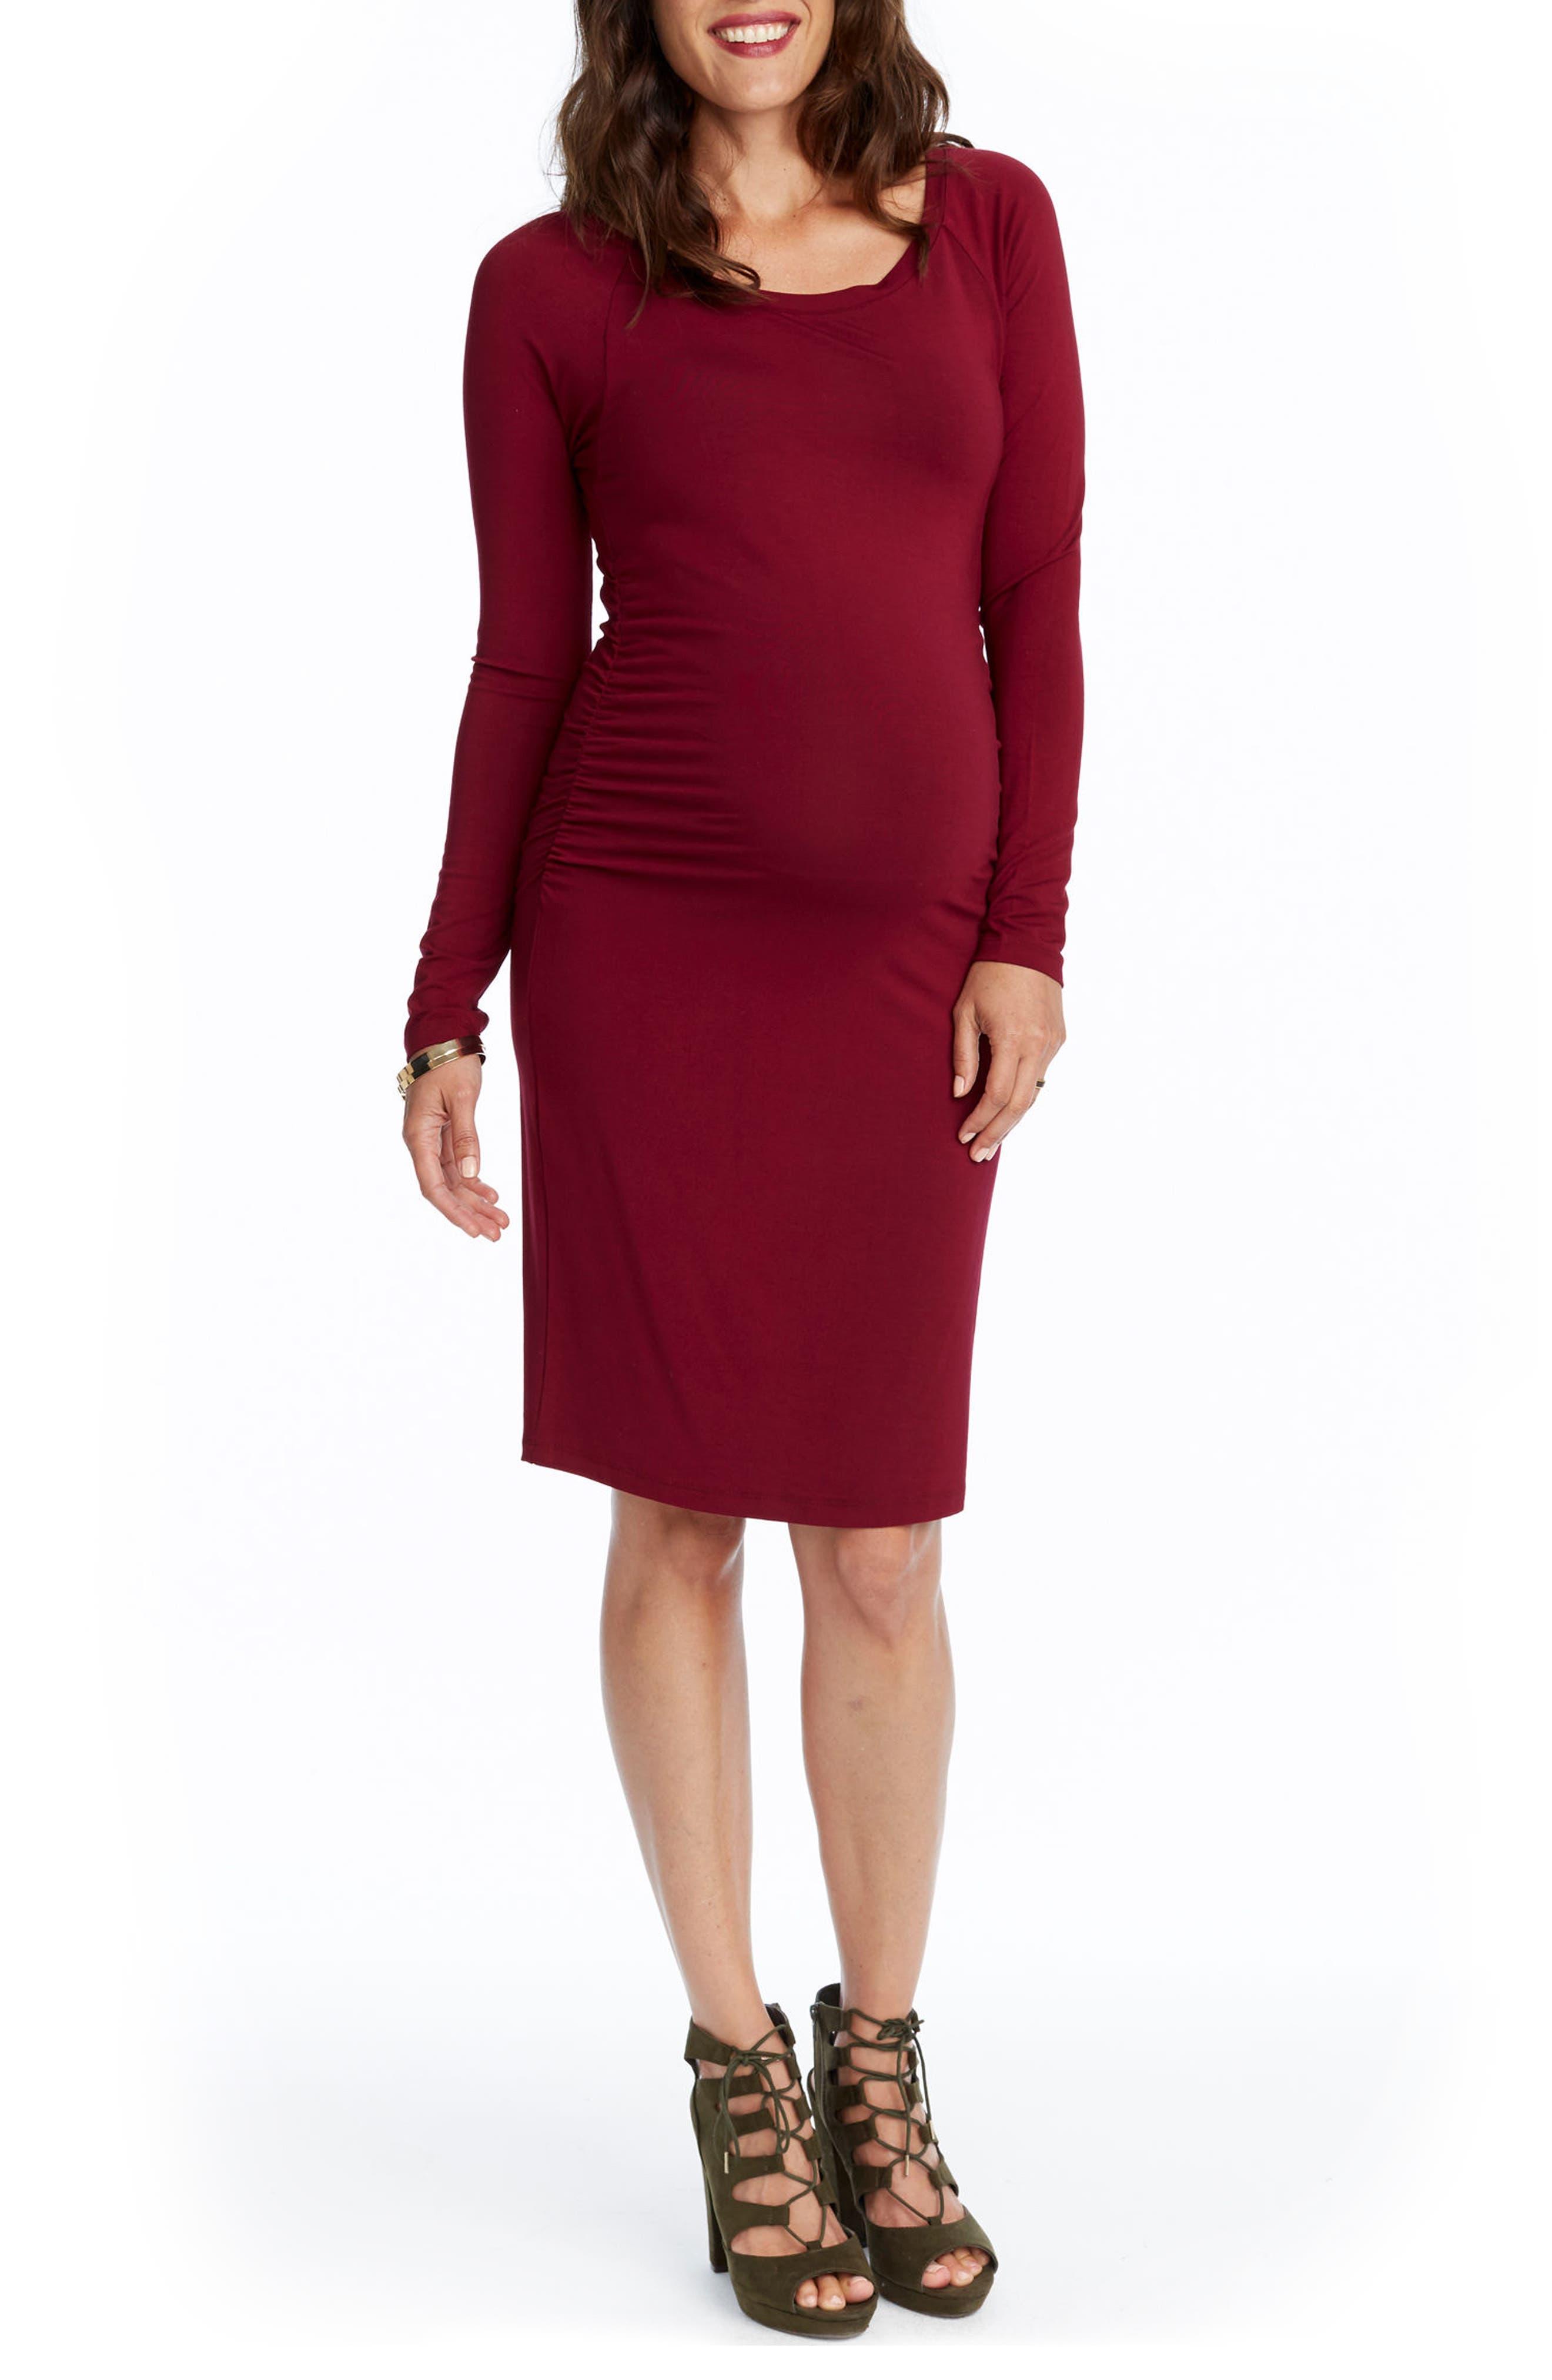 Rosie Pope Maternity Sheath Dress, Burgundy